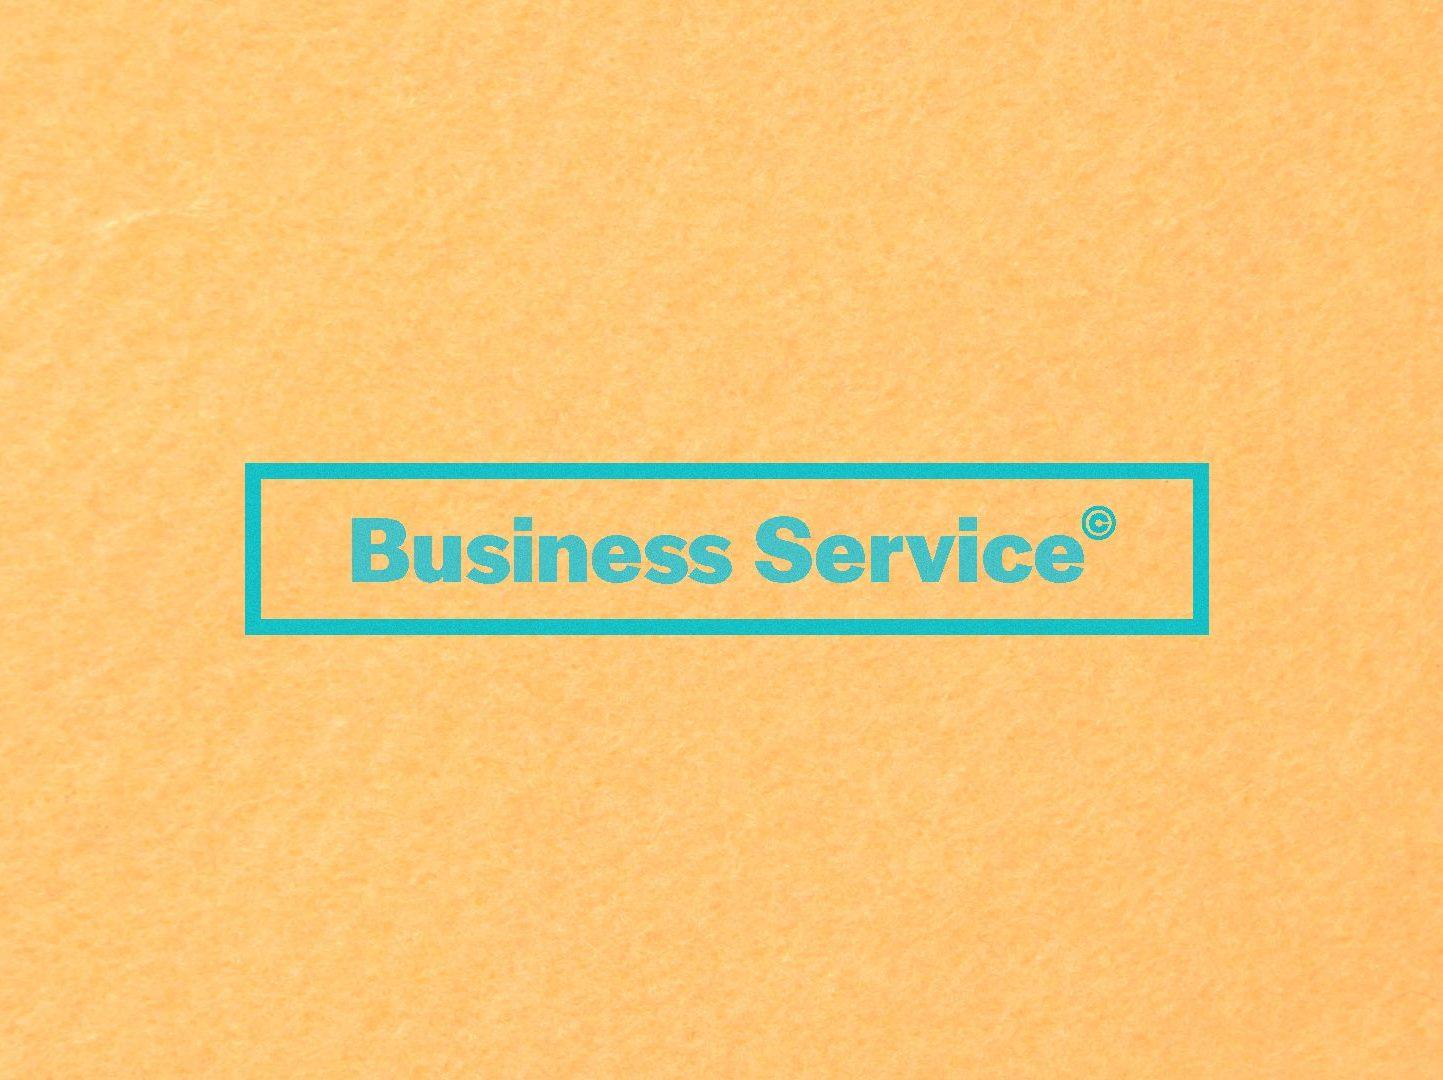 Business Service - Short